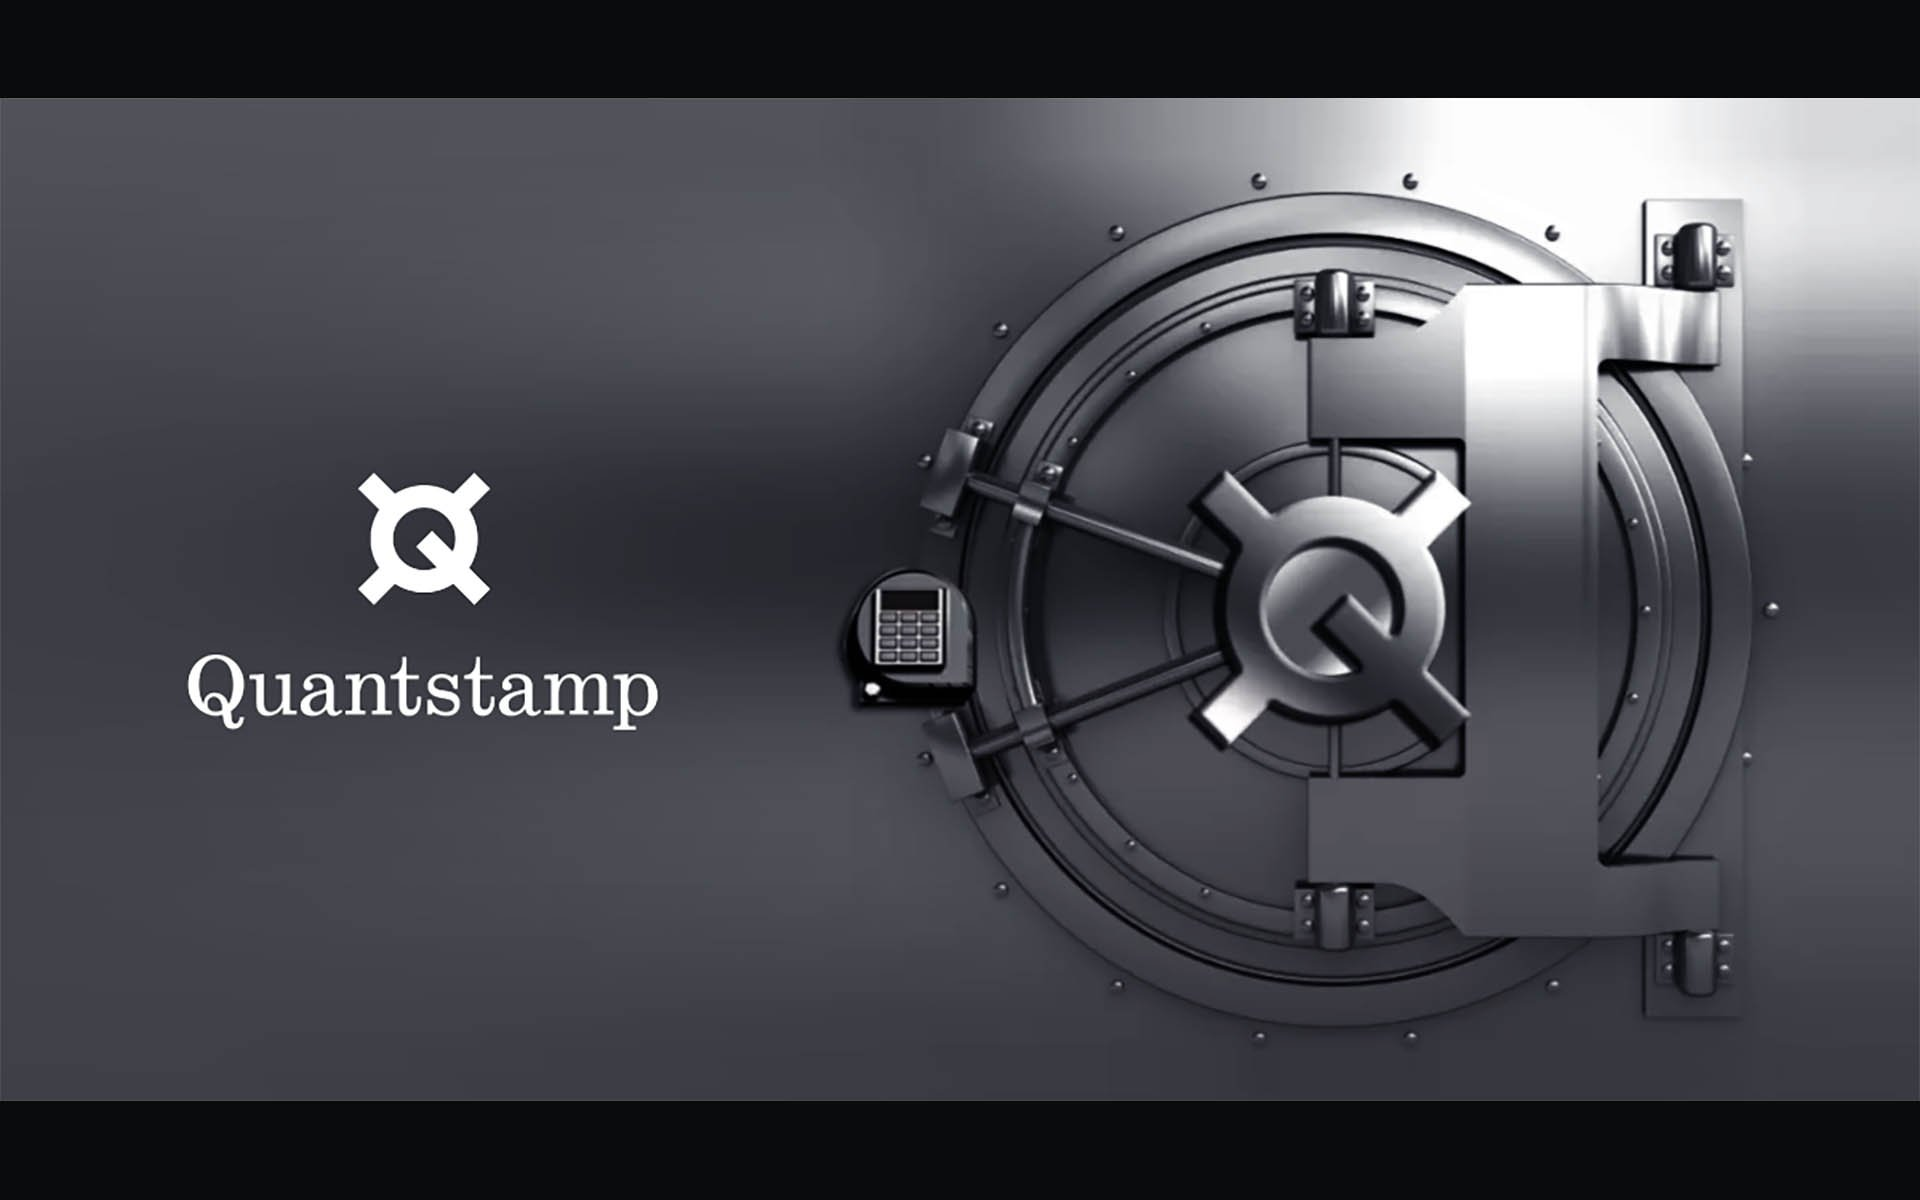 Smart Contract Security Startup Quantstamp Announces Token Sale